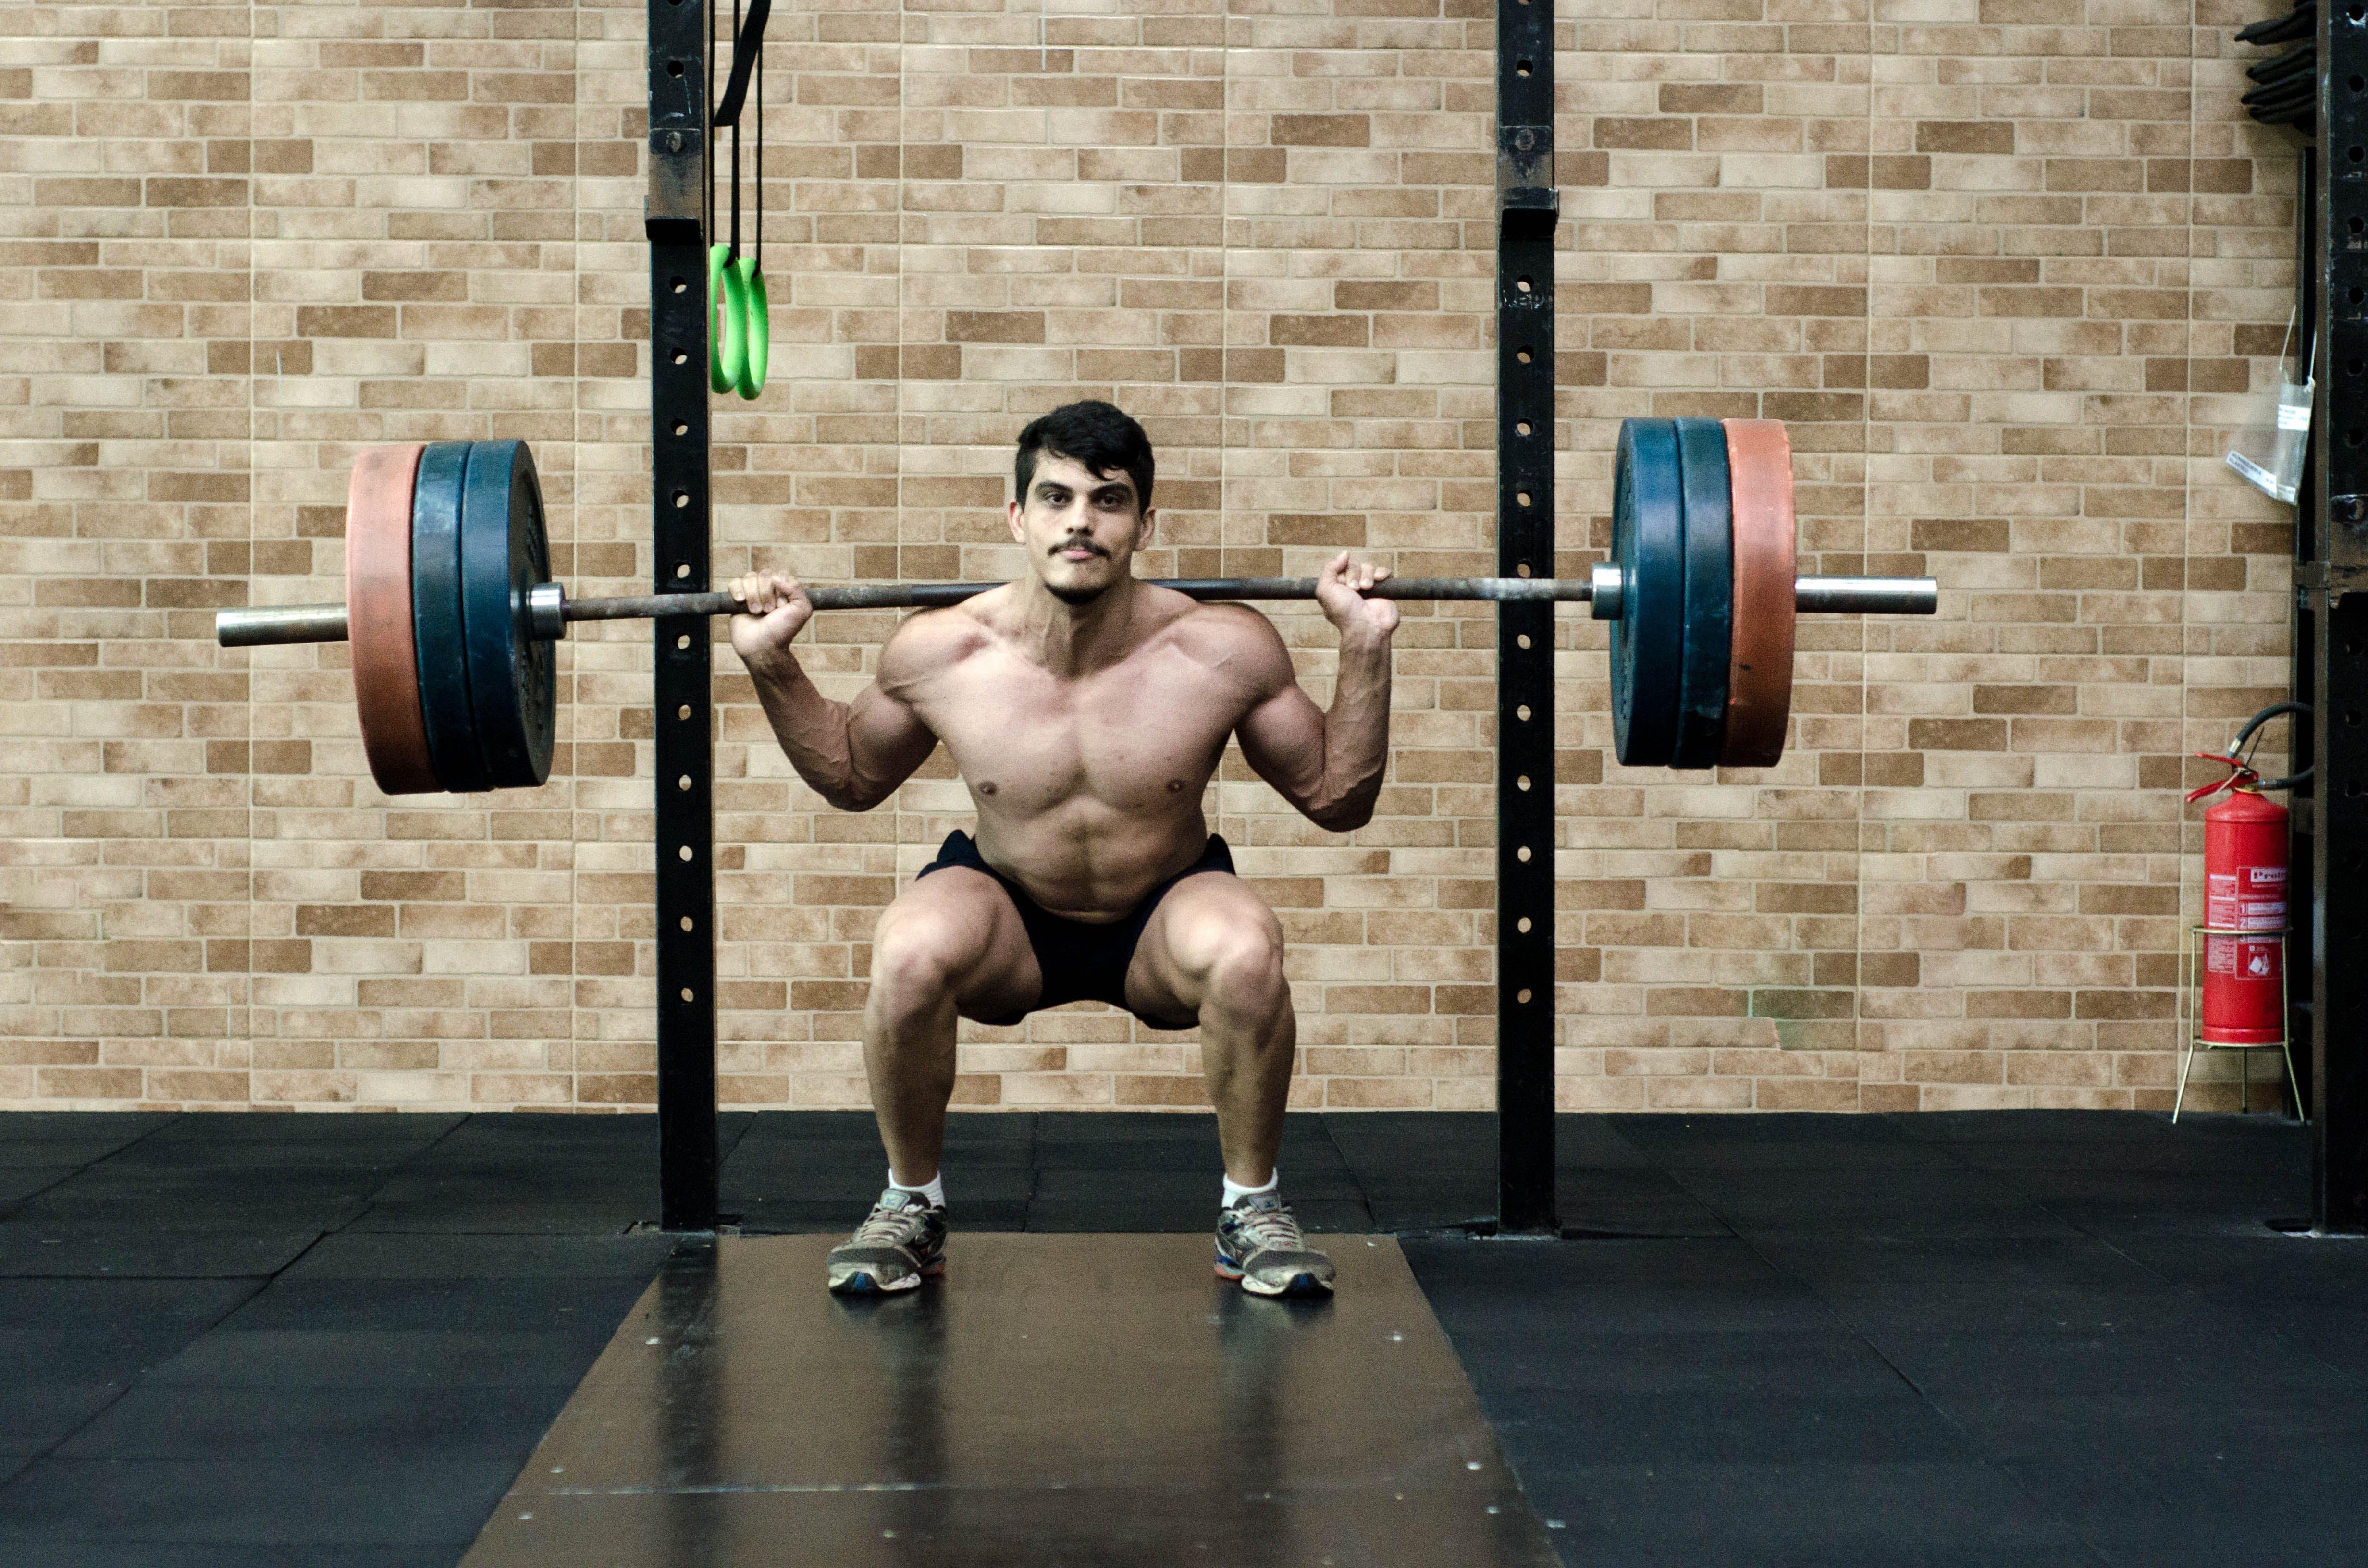 de atleta, bem-estar, bíceps, corpo